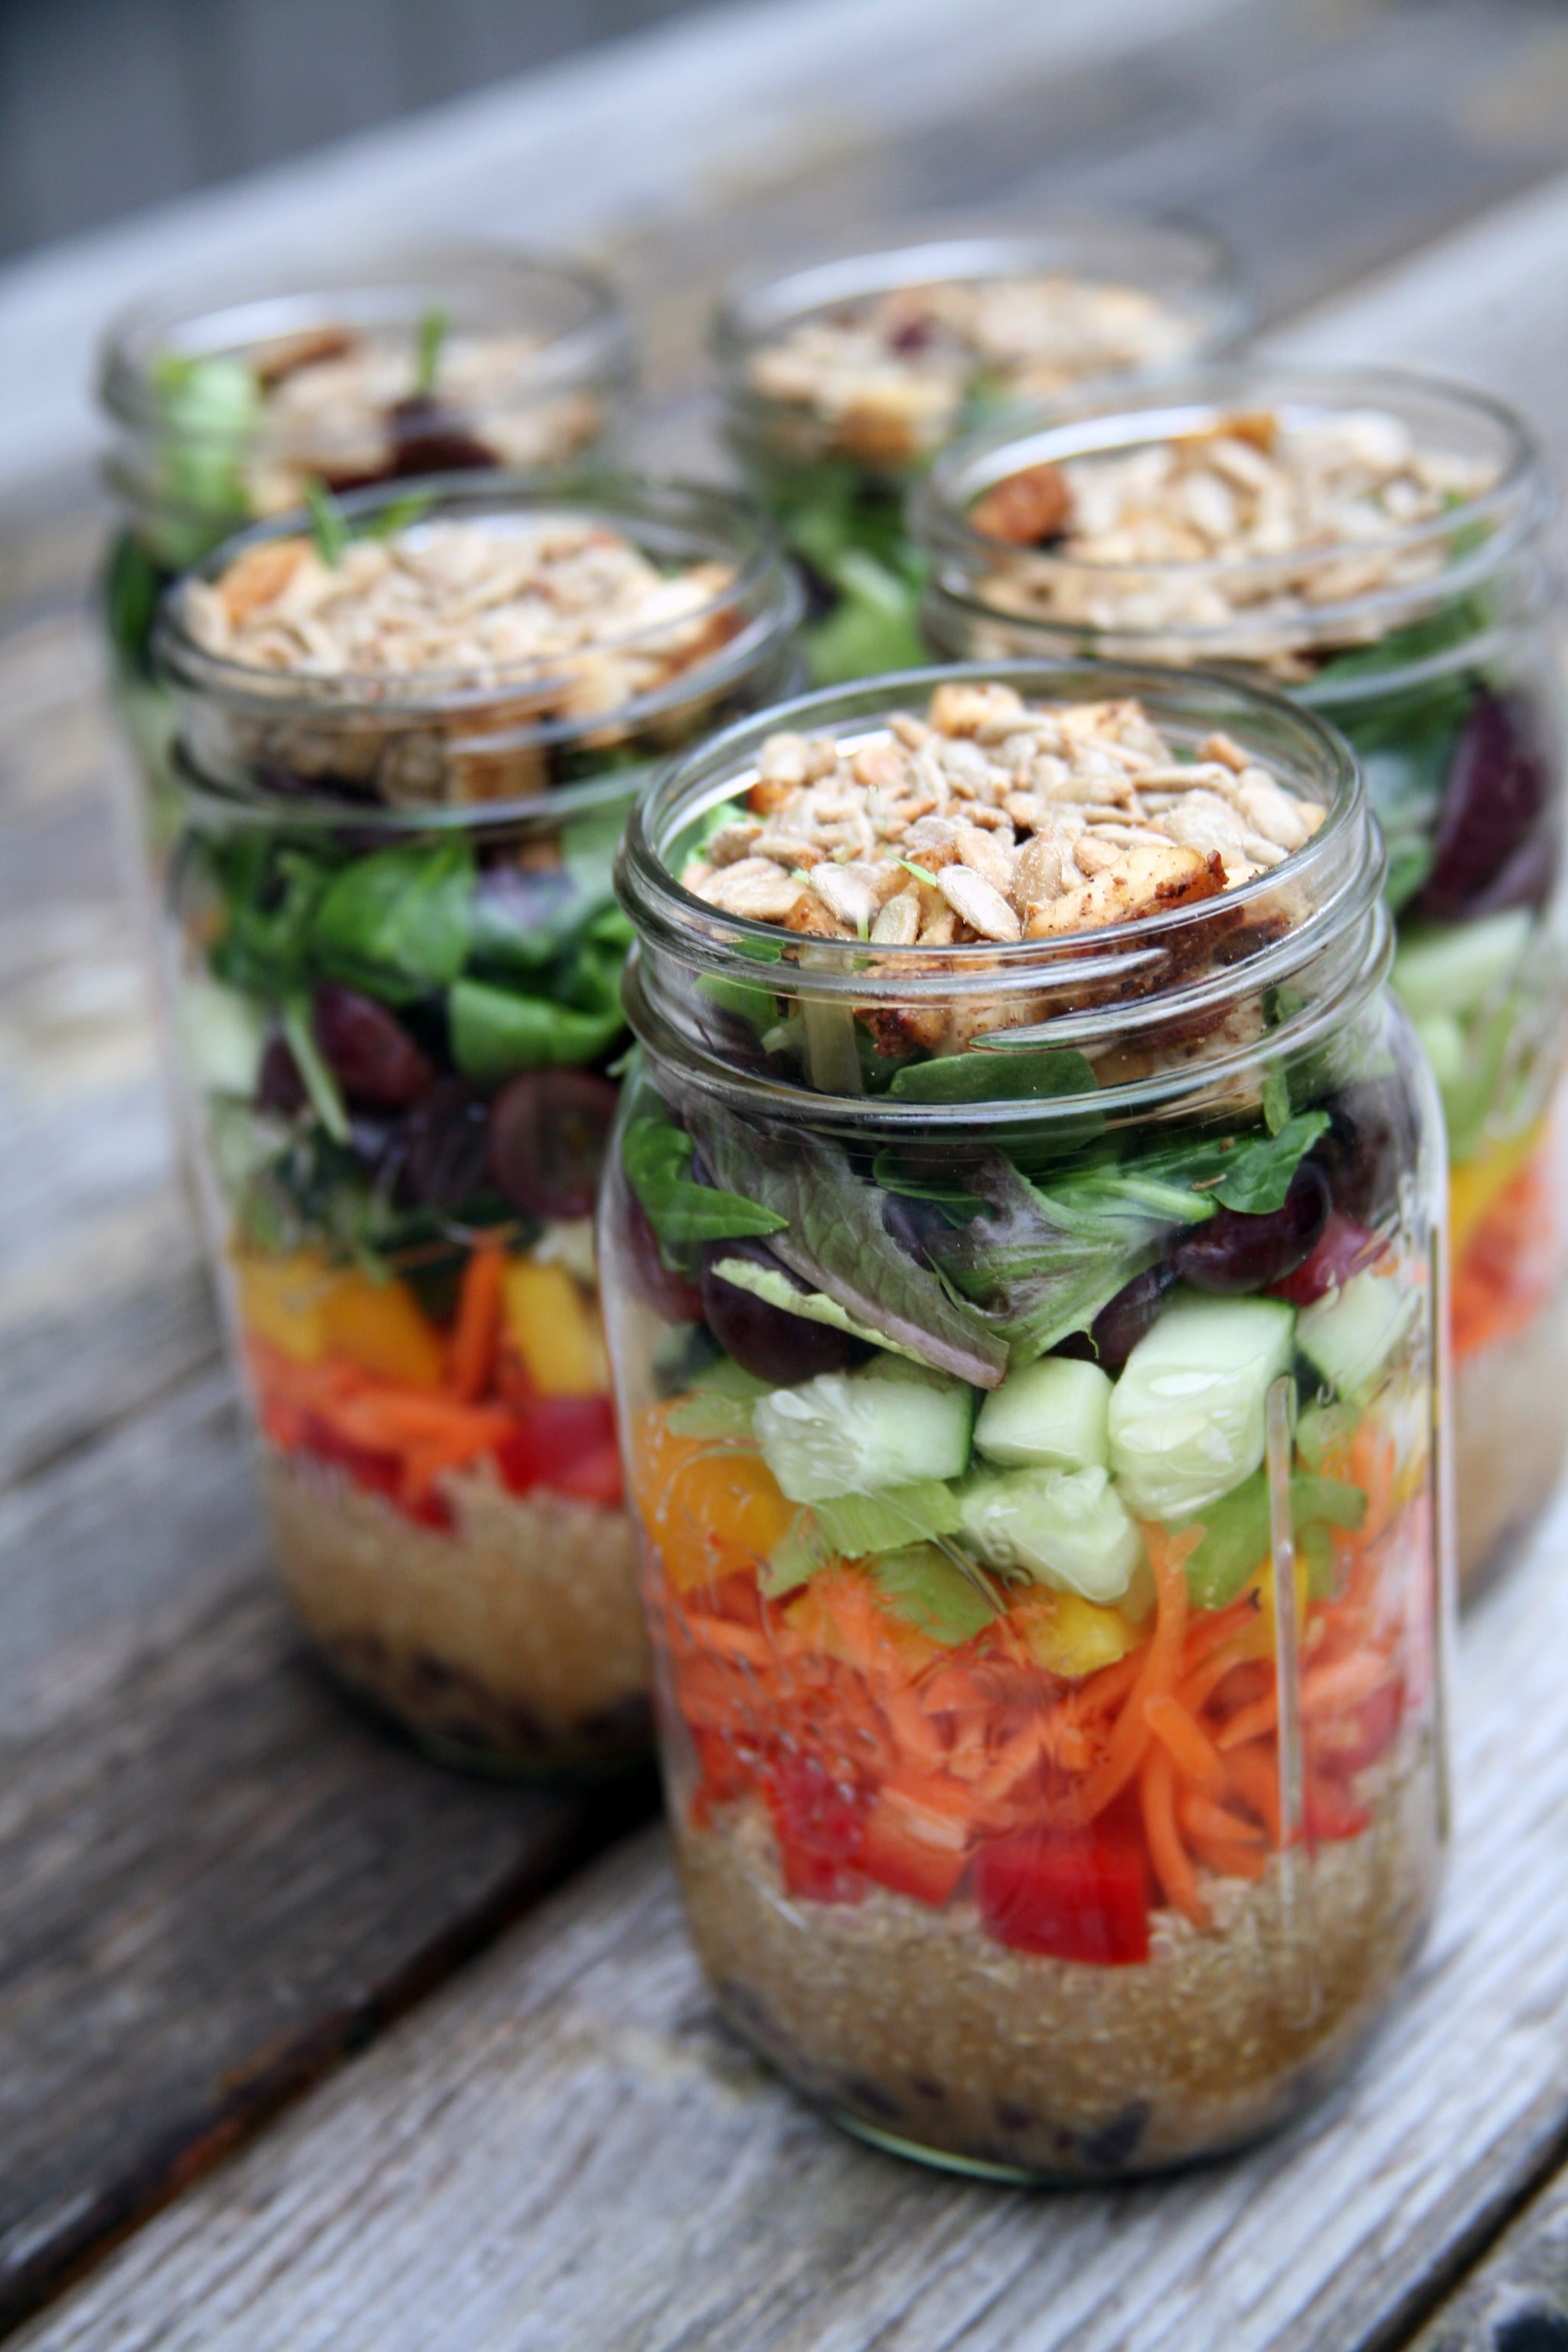 How to make a week of mason jar salads popsugar fitness australia forumfinder Gallery